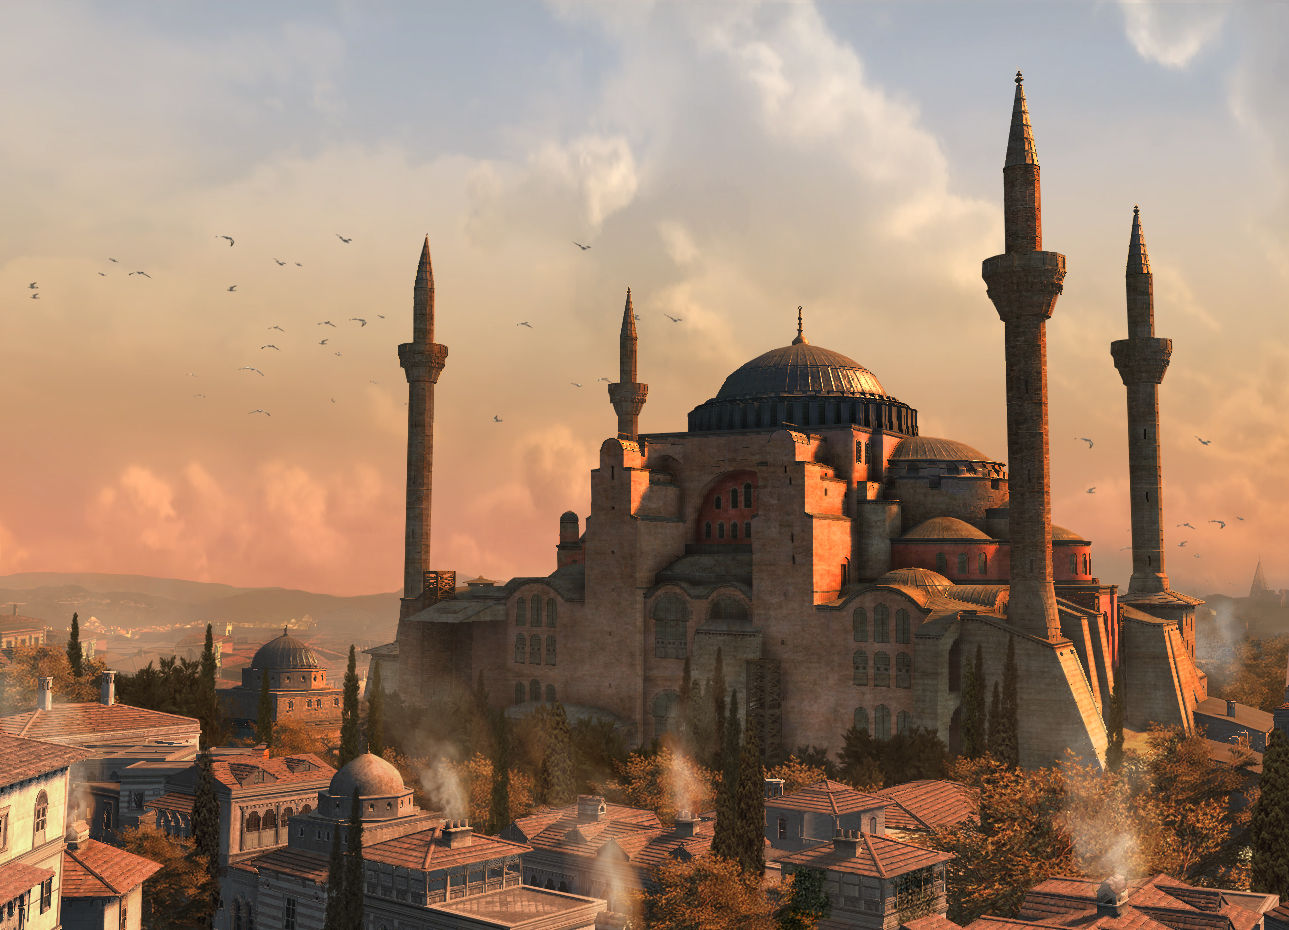 Assassin's Creed: Revelations Screenshot 7